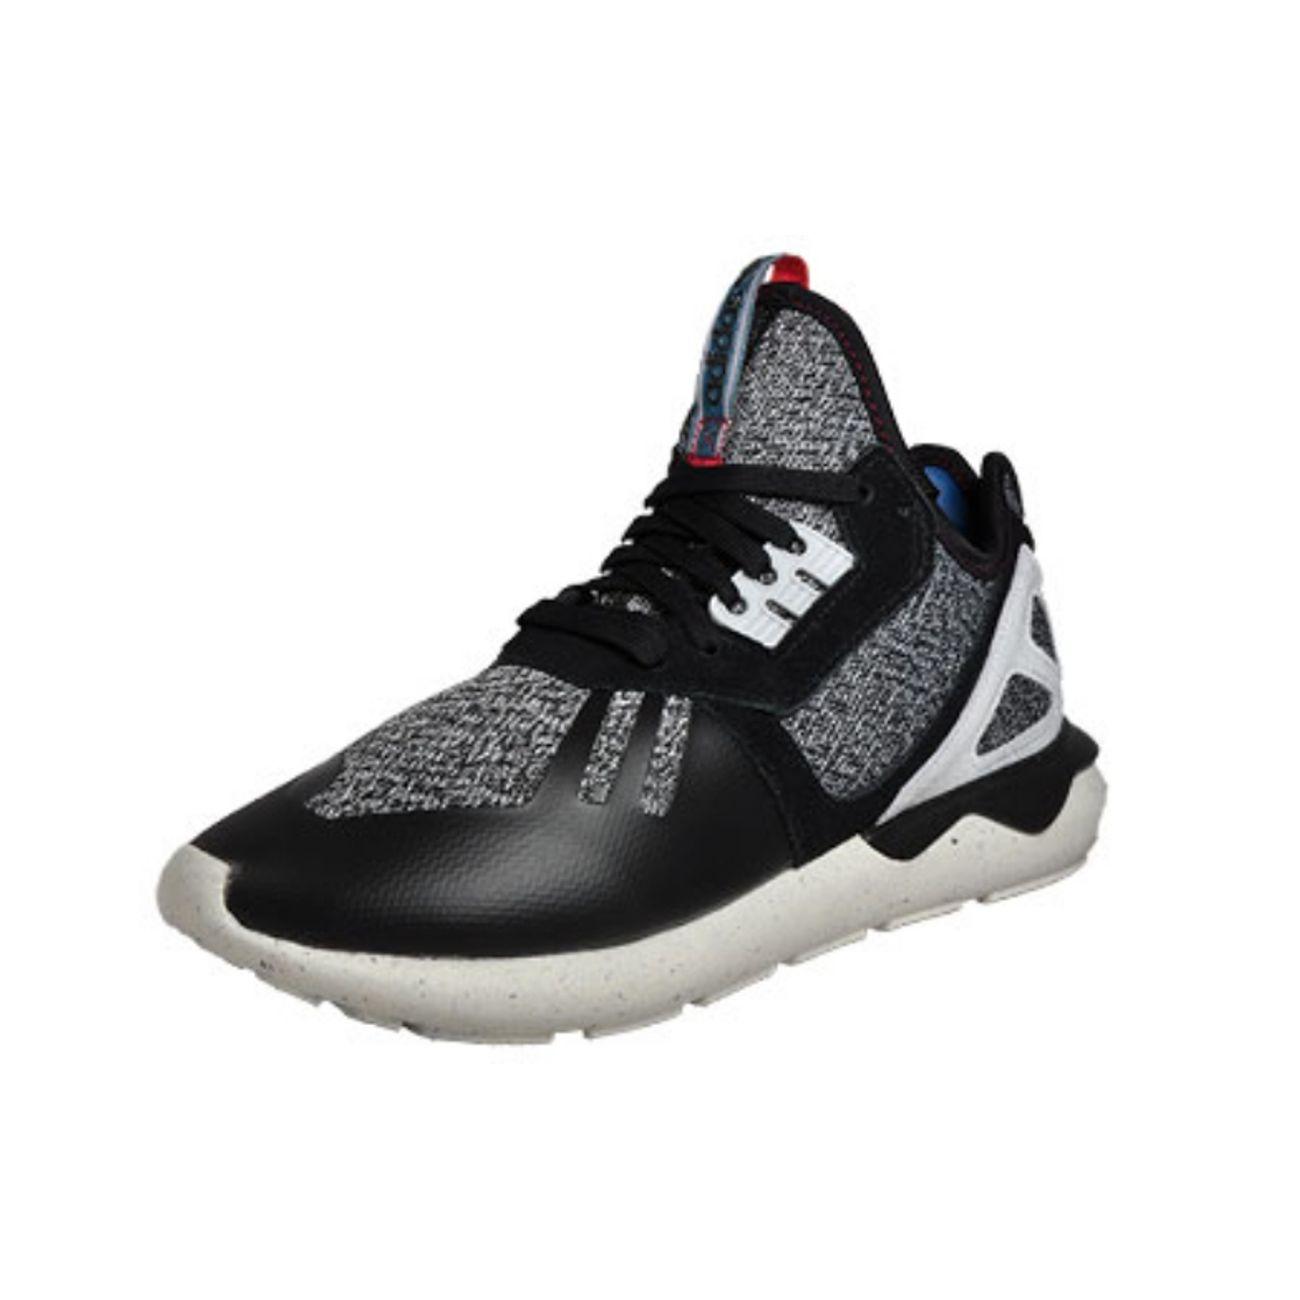 running homme ADIDAS Adidas Originals Tubular Runner Hommes Baskets  Chaussures Sportives 502033186a57